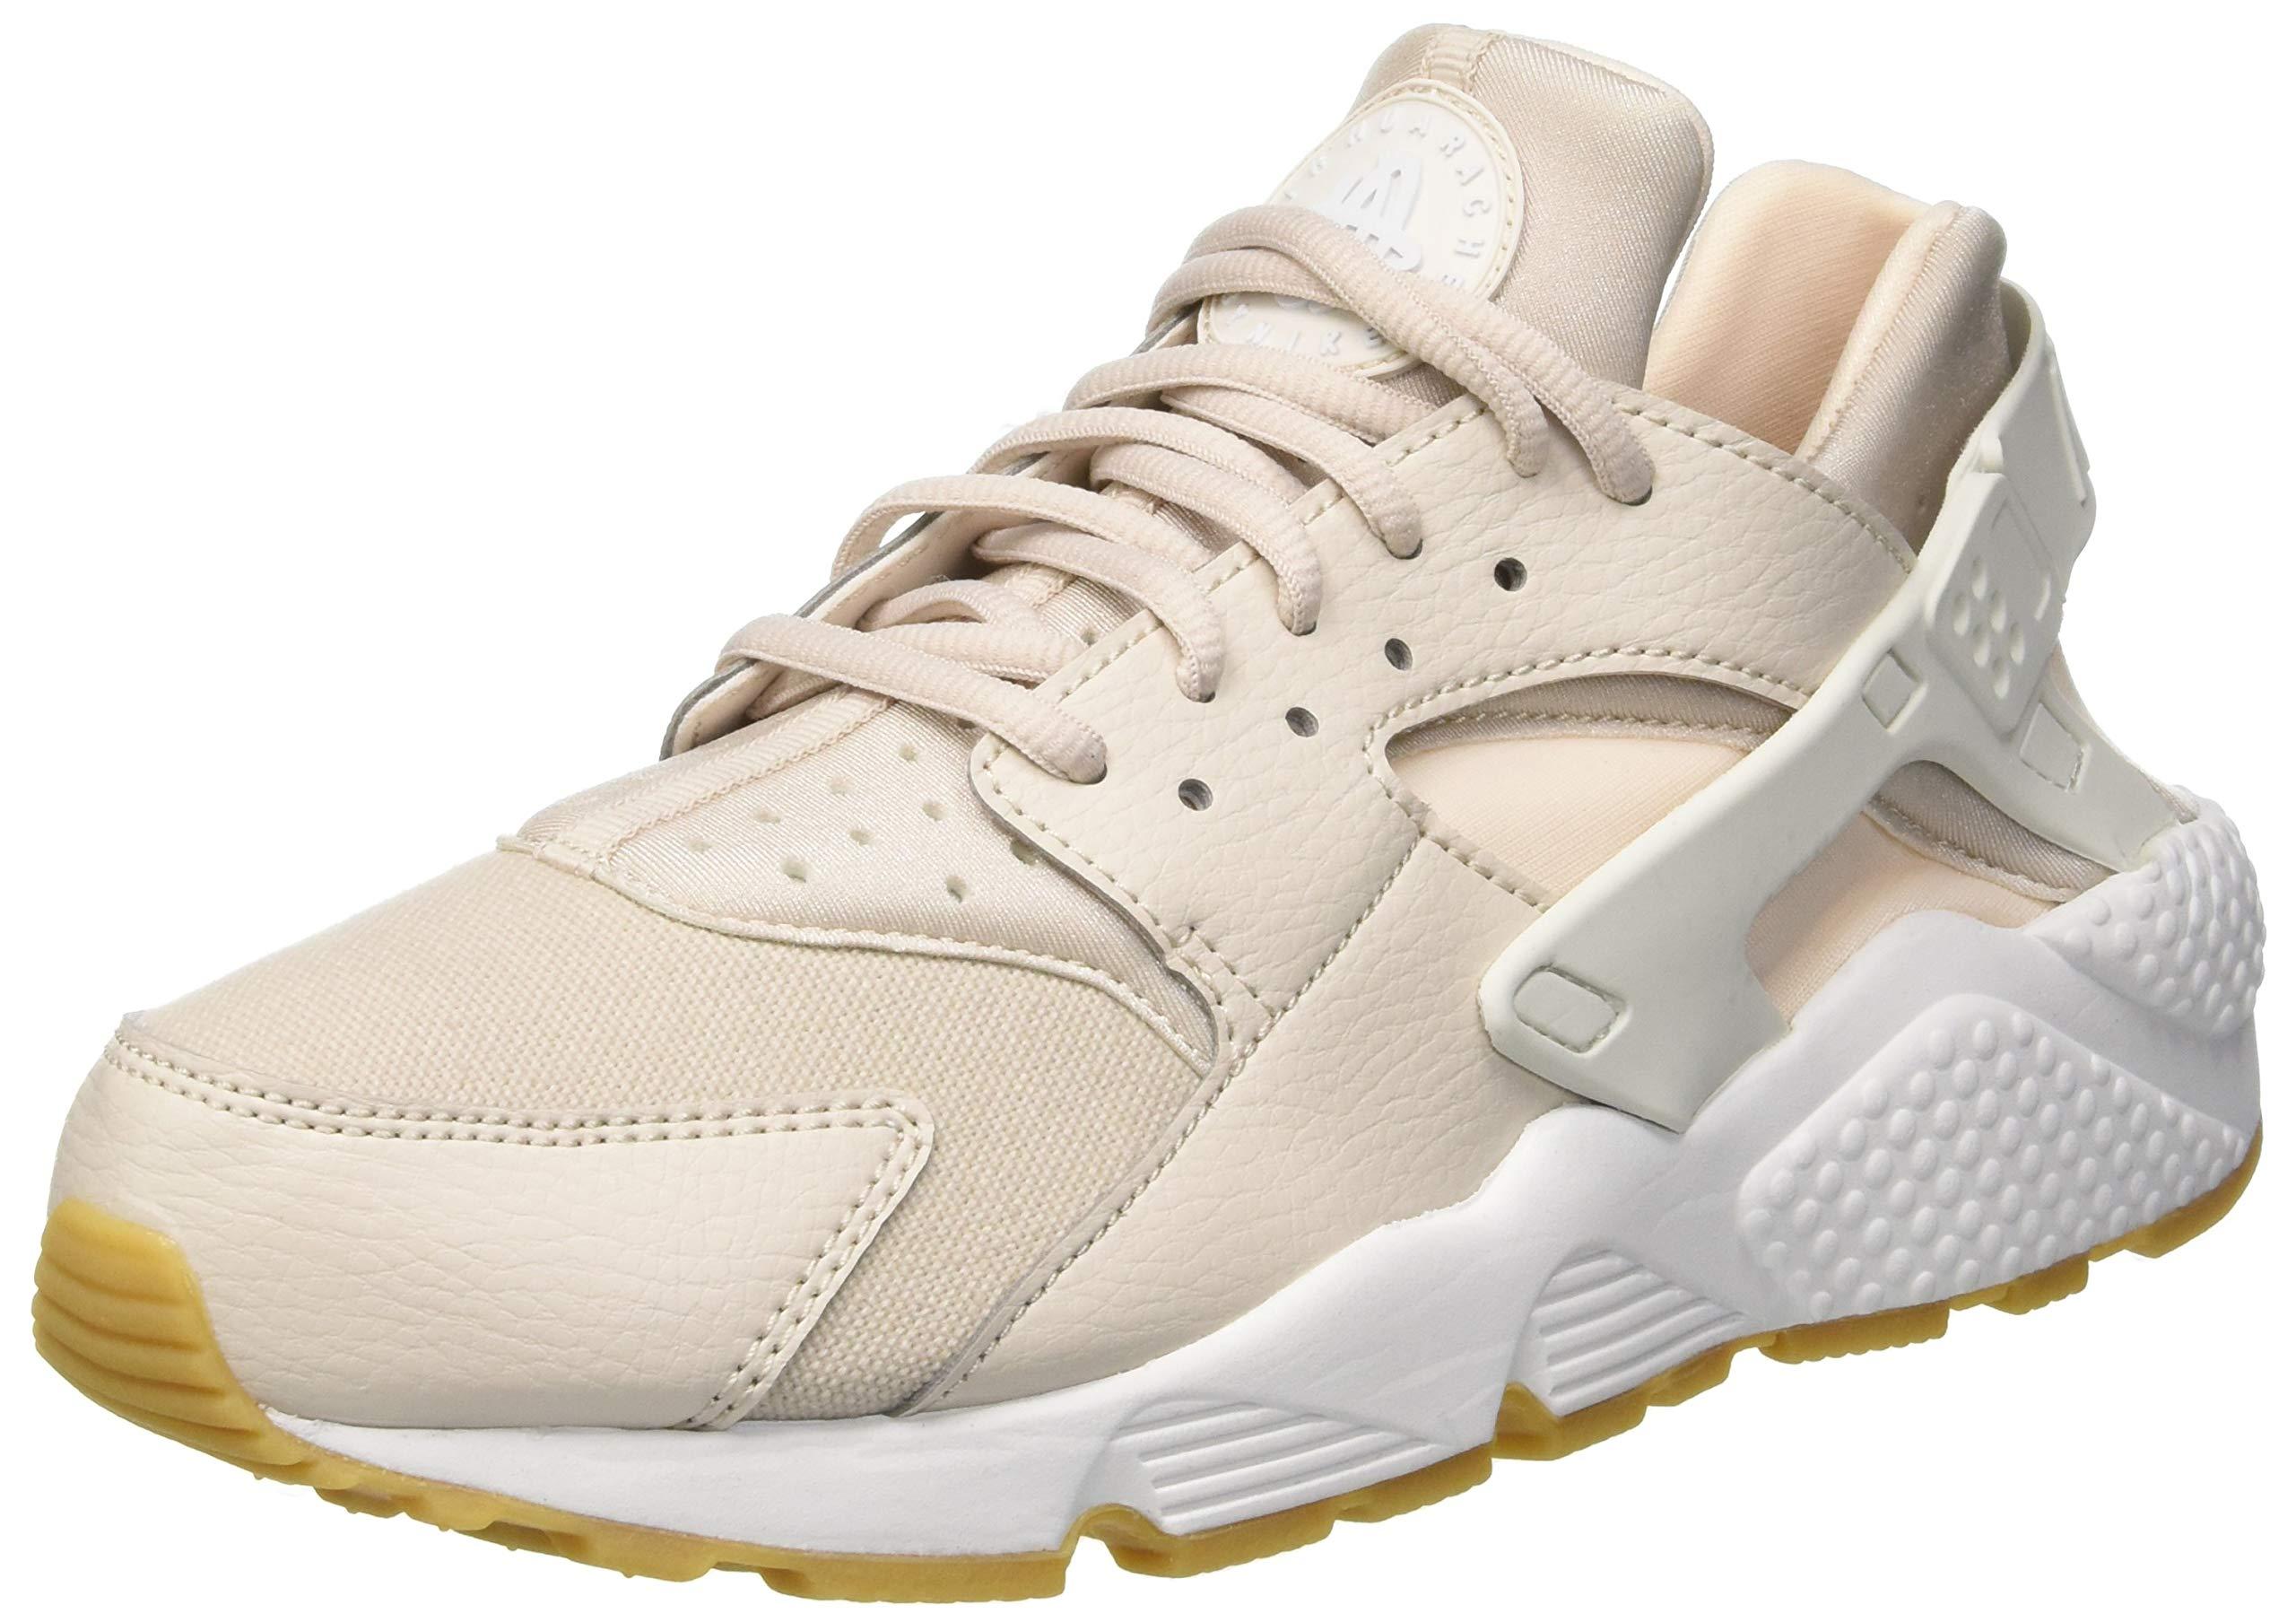 Nike Women's Air Huarache Run Gymnastics Shoes, Beige (Desert Sand/Summit White/Guava 034), 4 UK